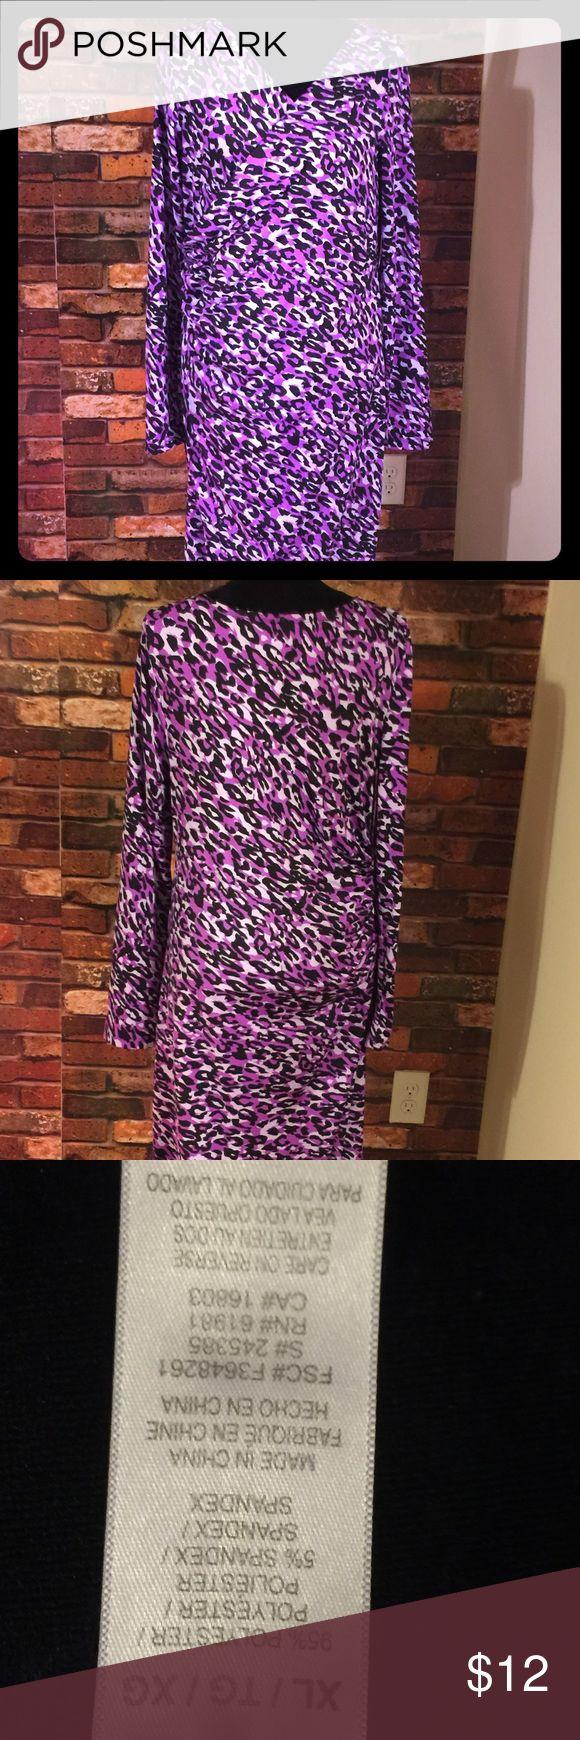 Dress Purple long sleeve animal print dress Dresses Long Sleeve